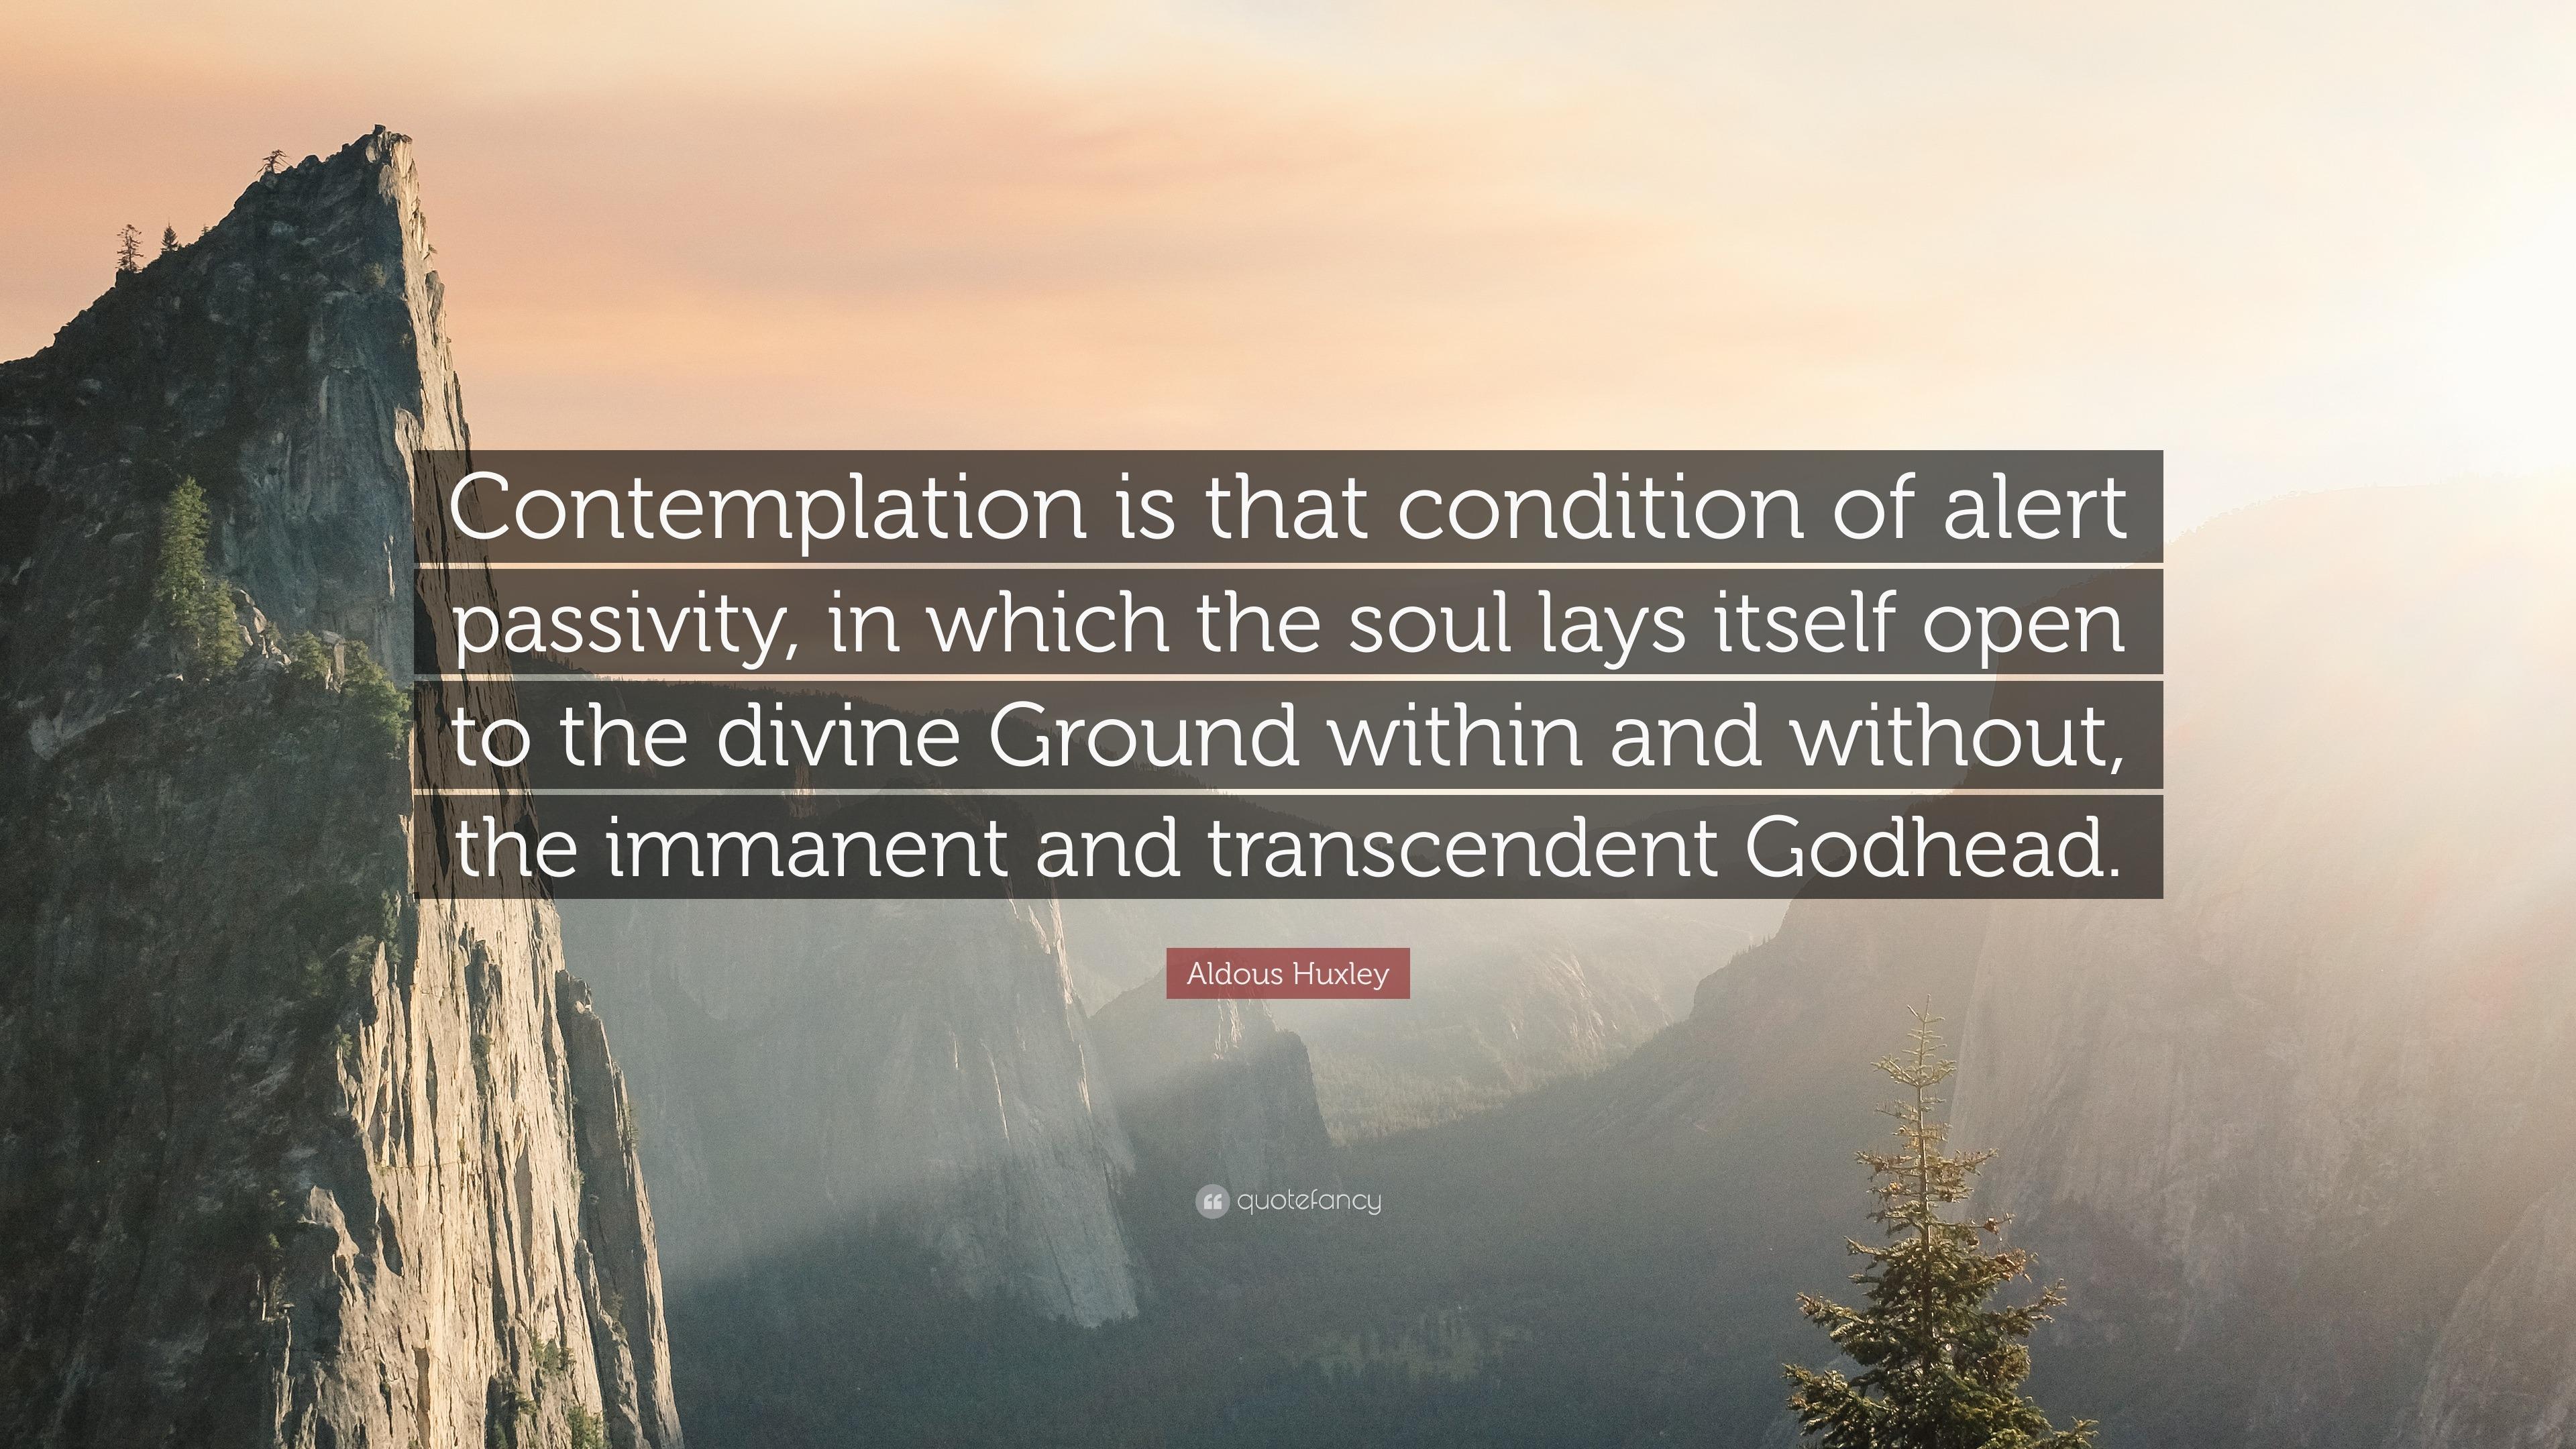 The Divine Contemplation